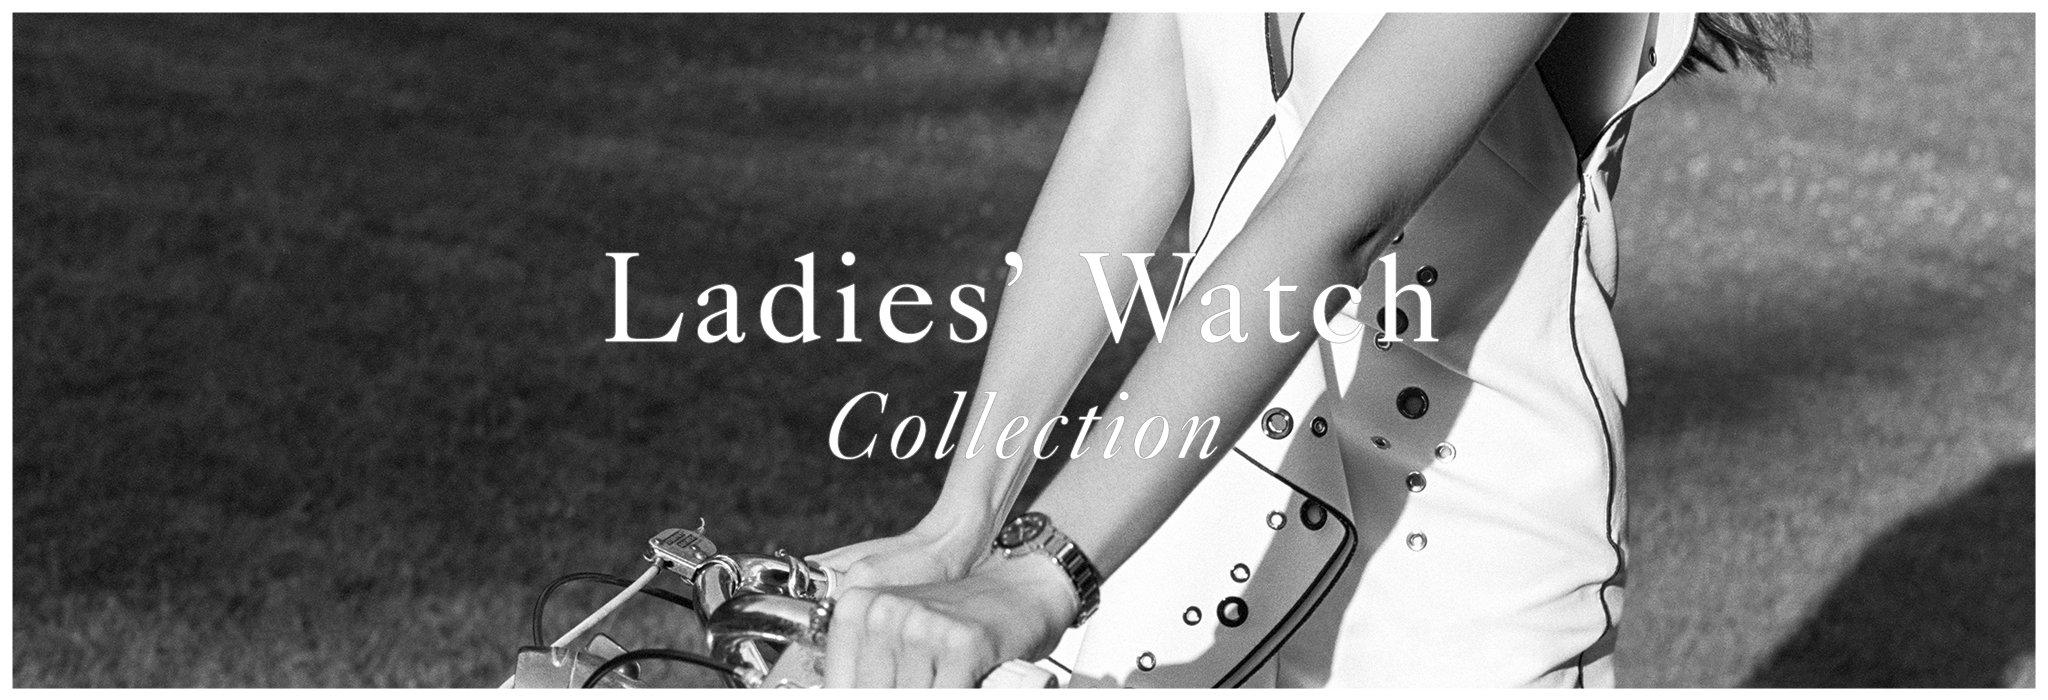 Conheça os relógios femininos Bulova